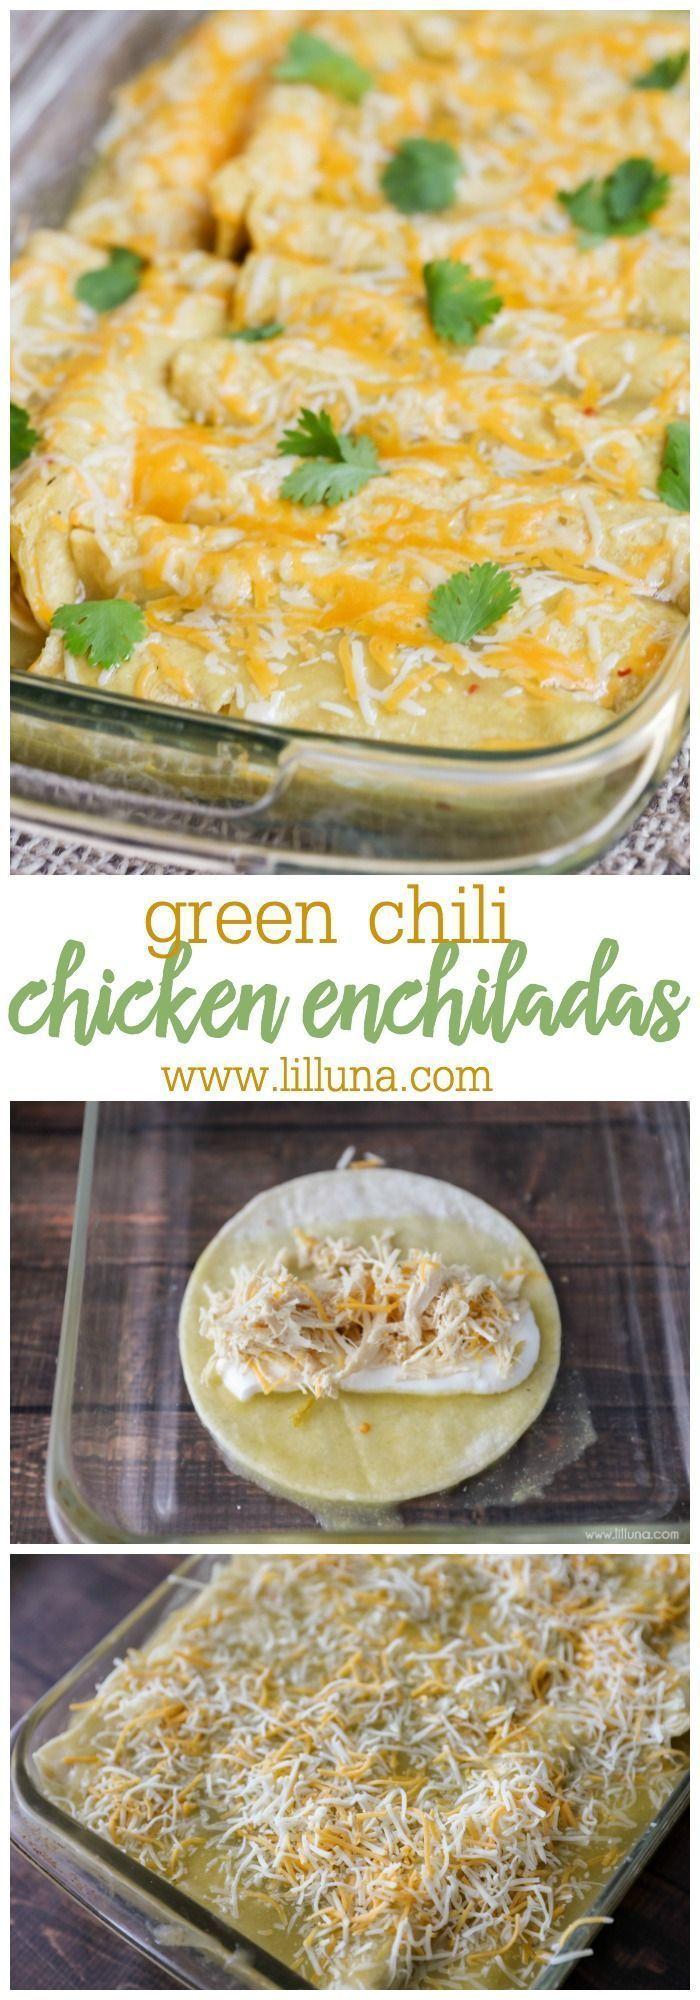 Easy Chicken Enchilada images